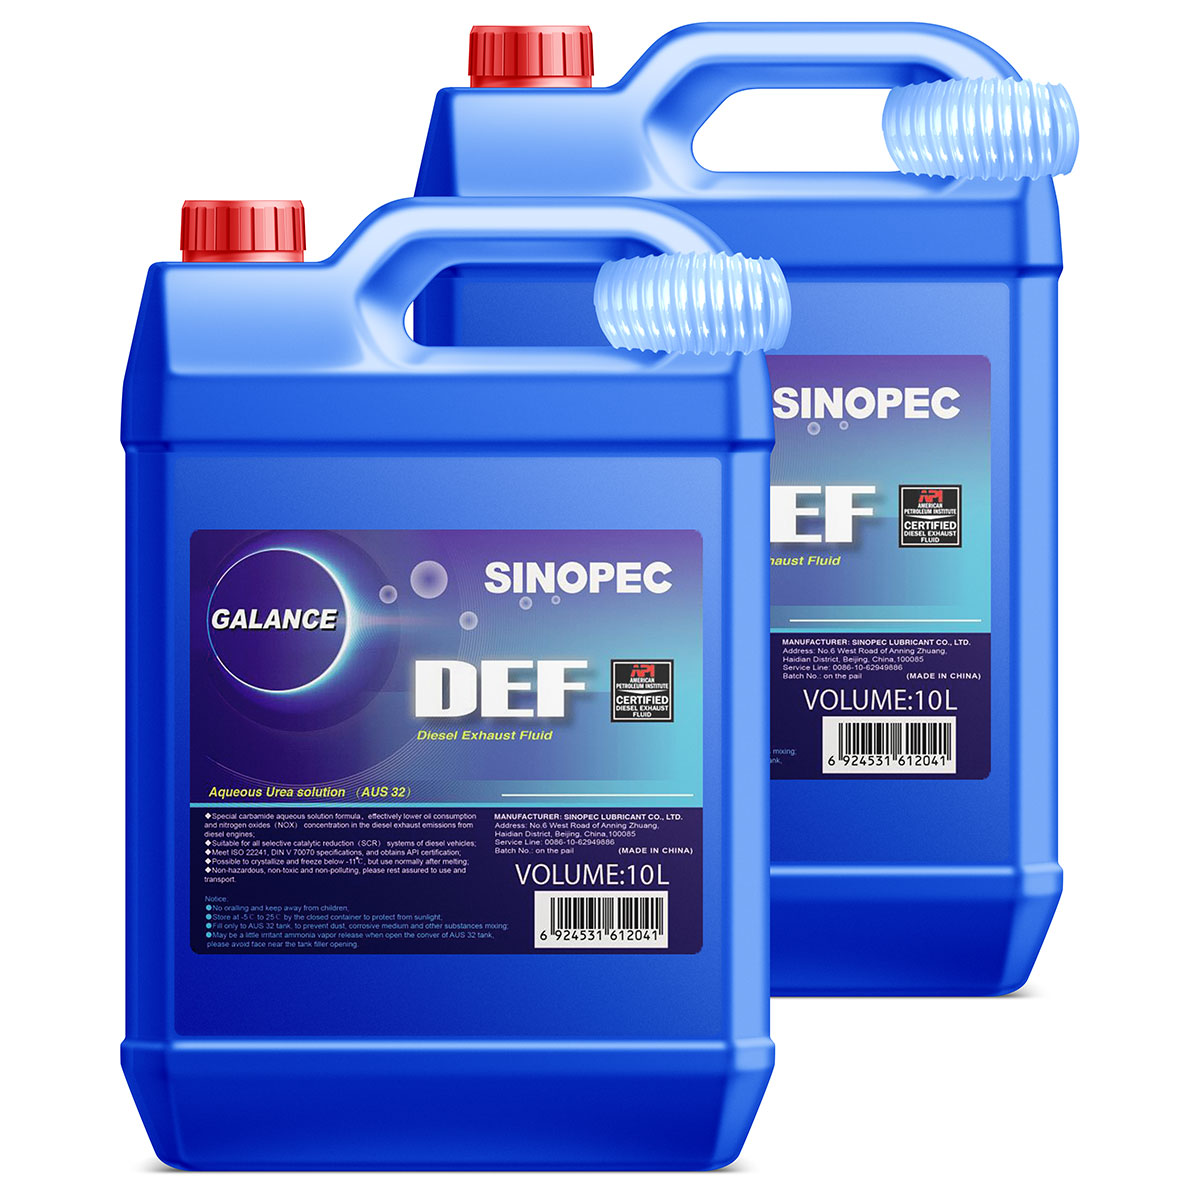 Diesel Exhaust Fluid >> Sinopec Def Diesel Exhaust Fluid 2 2 5 Gallon Jugs Walmart Com